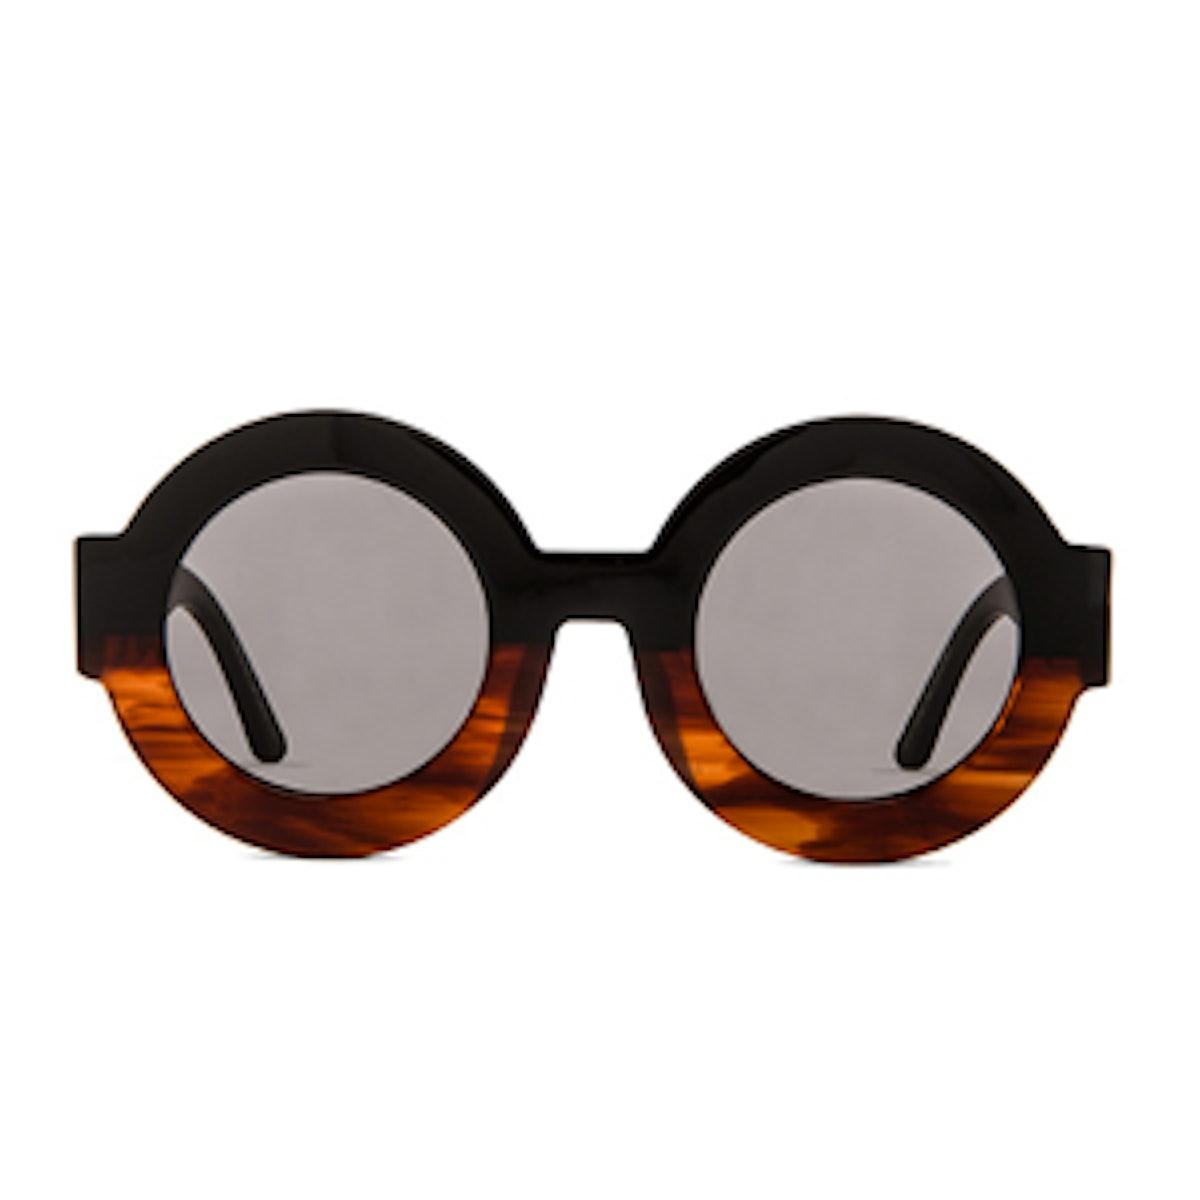 Scapula Sunglasses